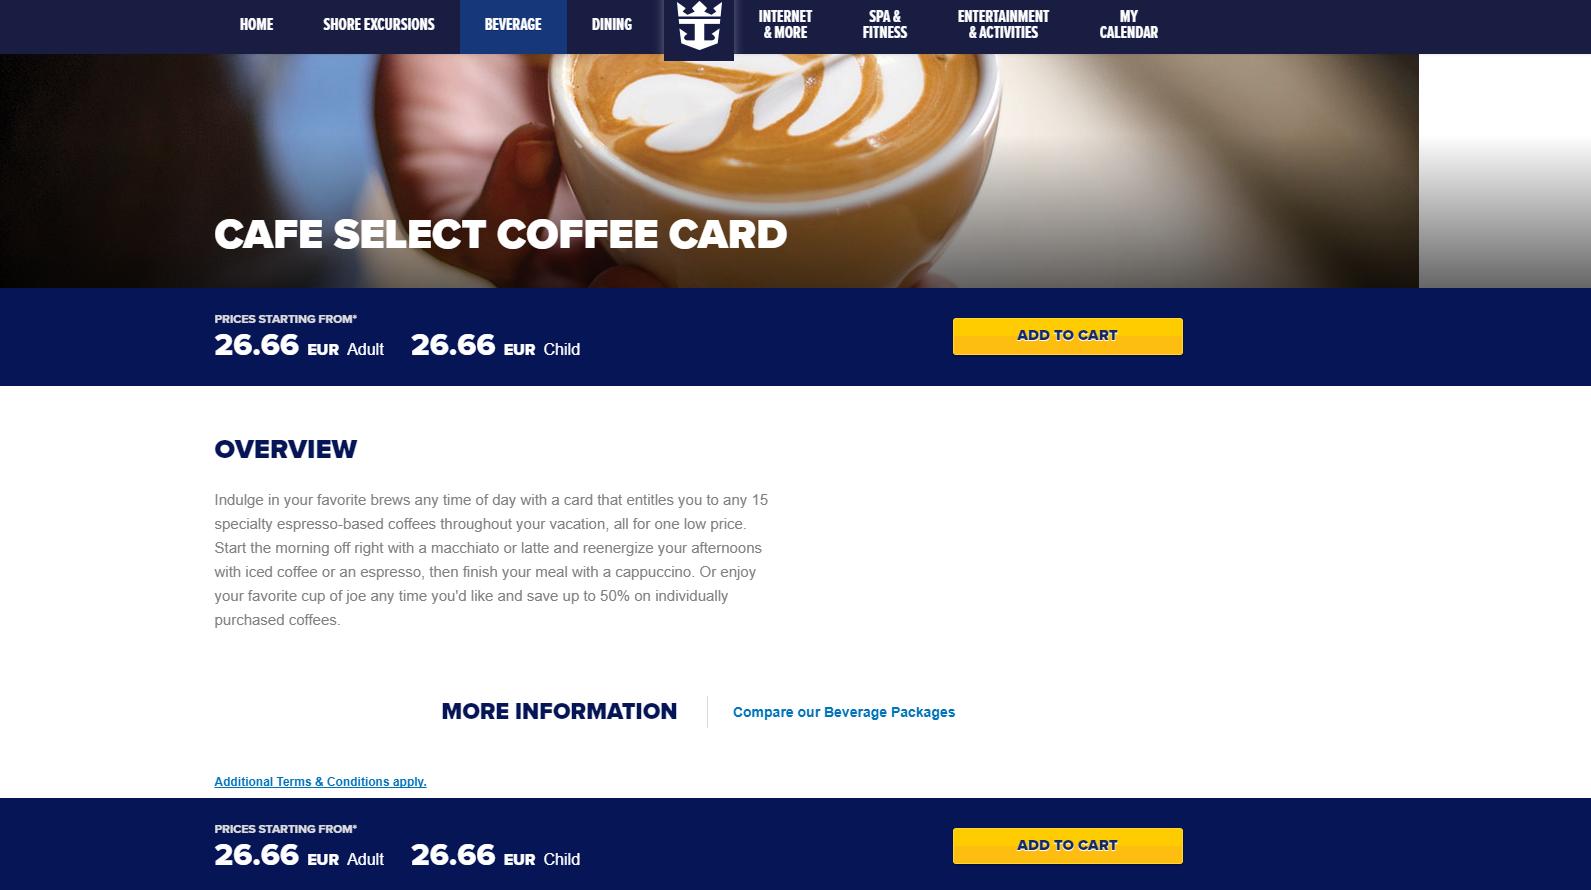 Cafe Select Coffee Card Royal Caribbean Dining Royal Caribbean Blog